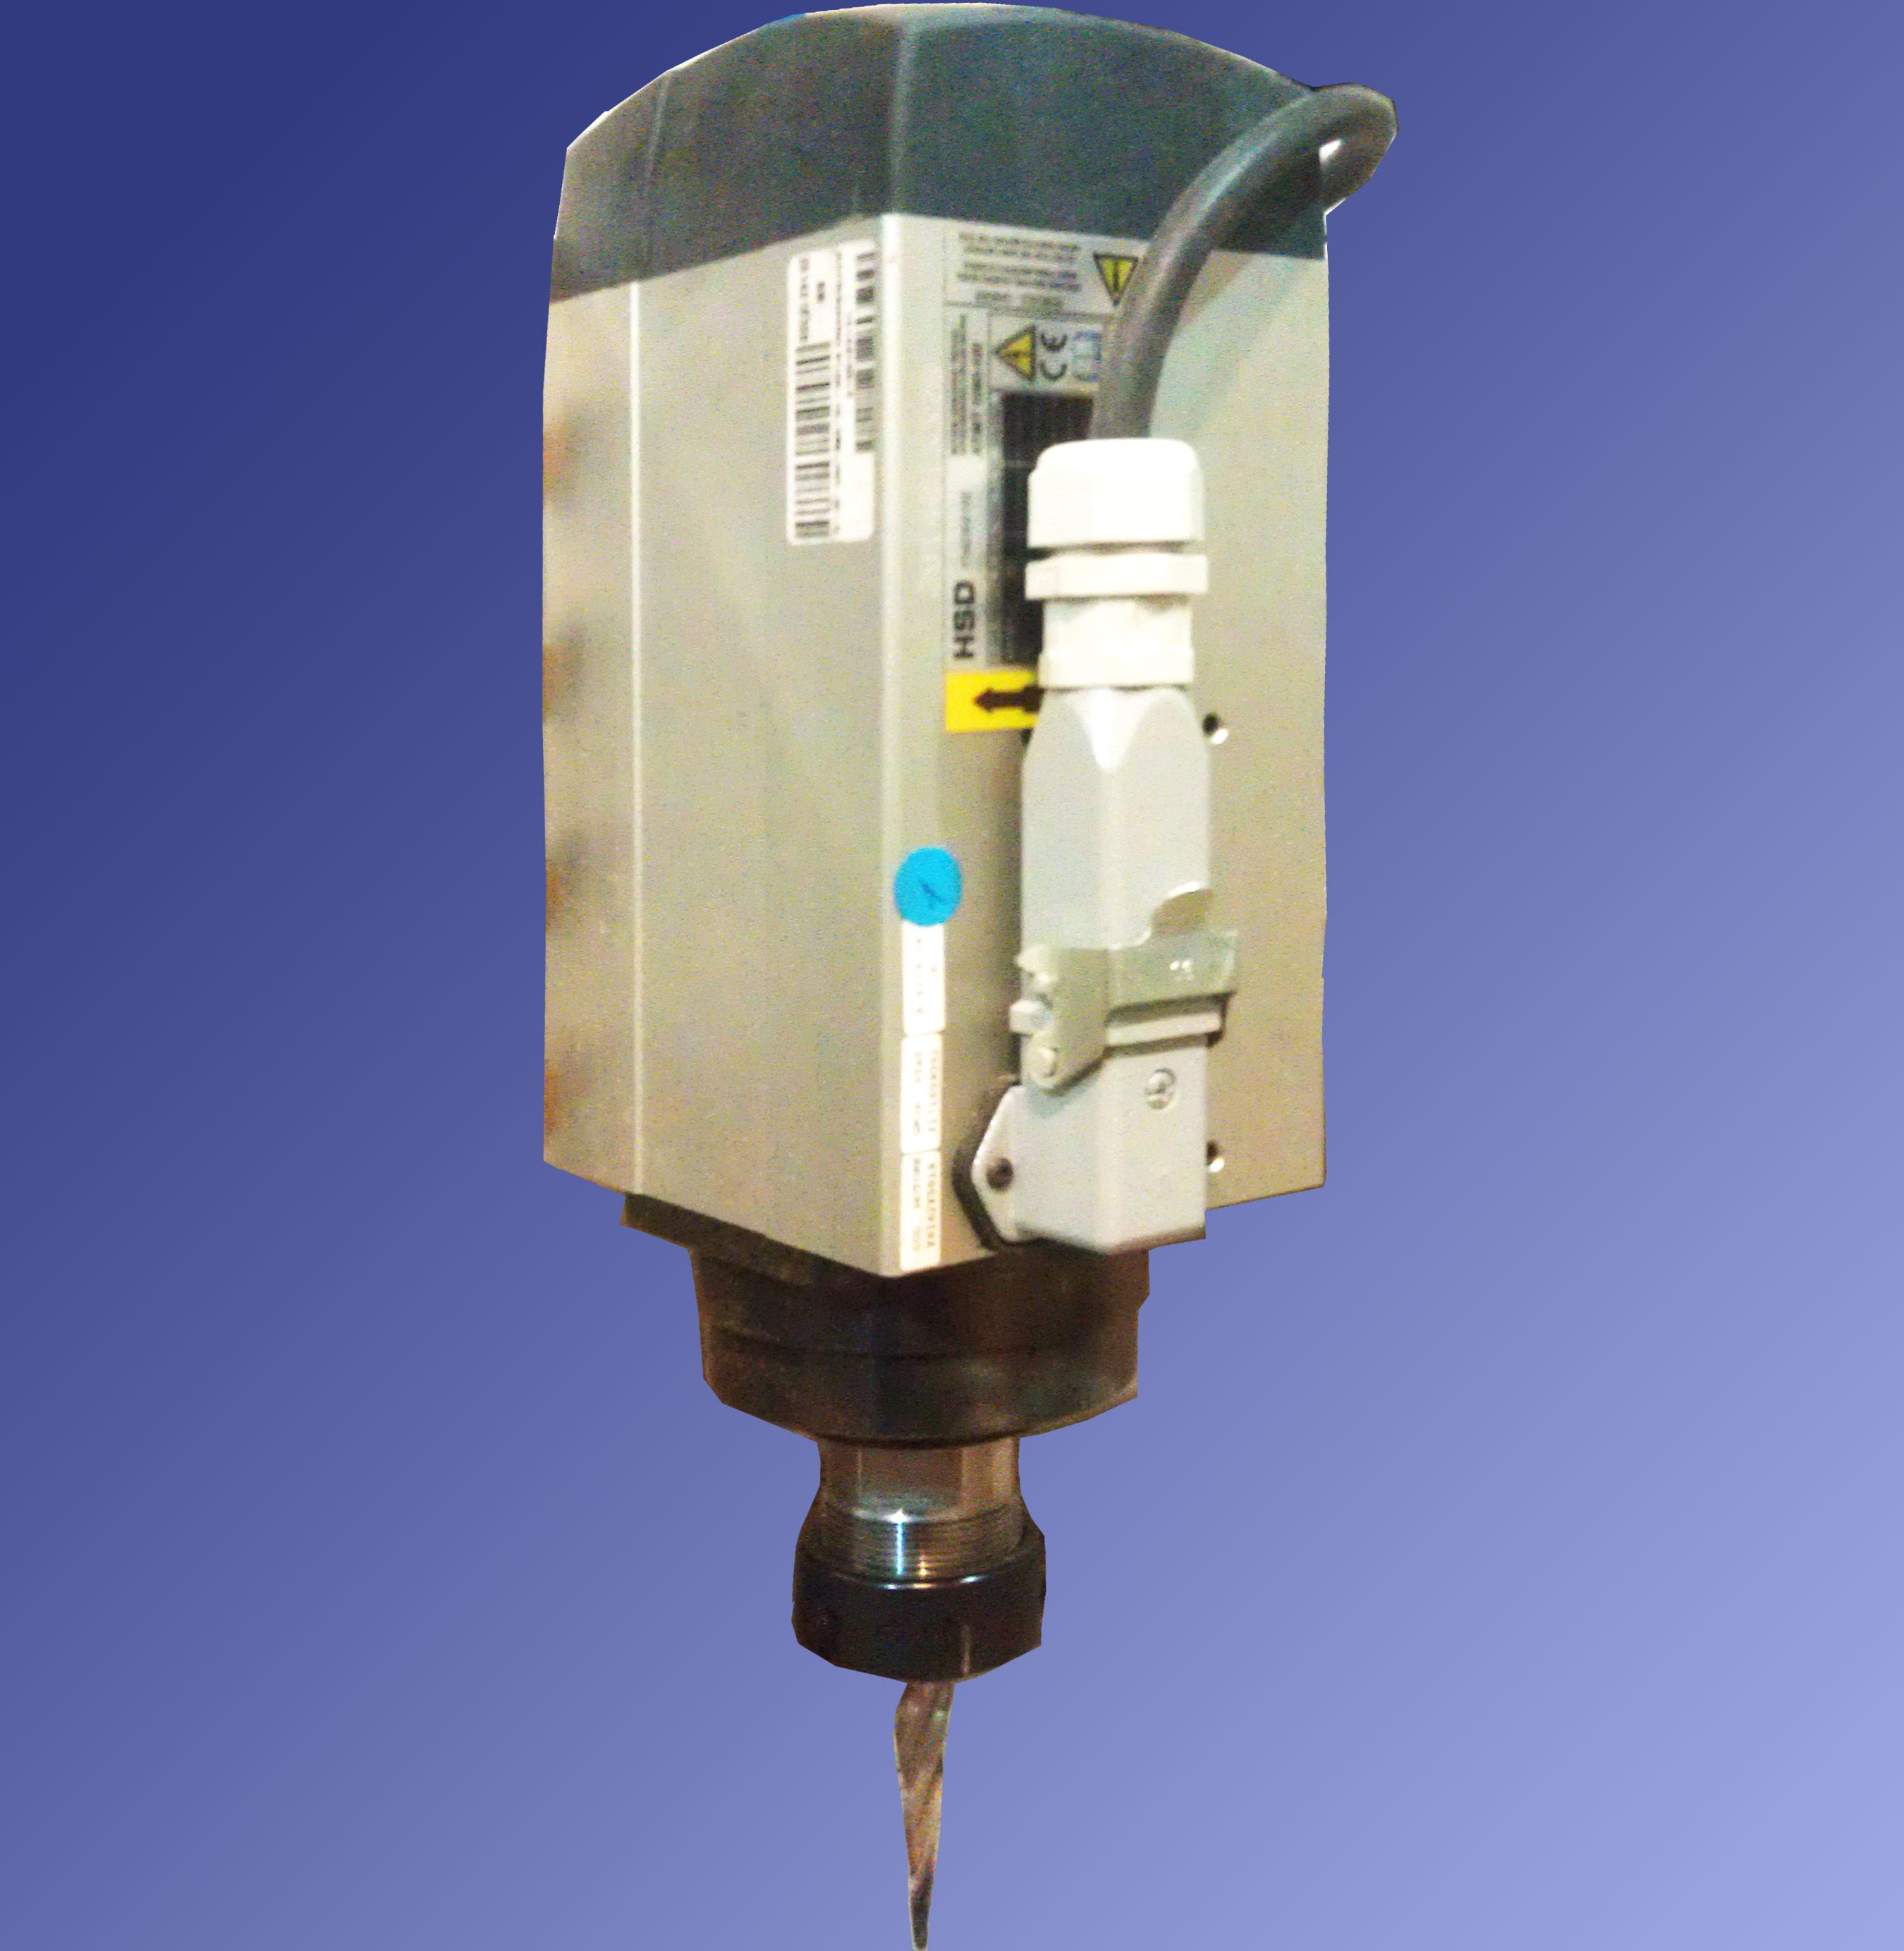 اسپیندل موتورSpindle motor